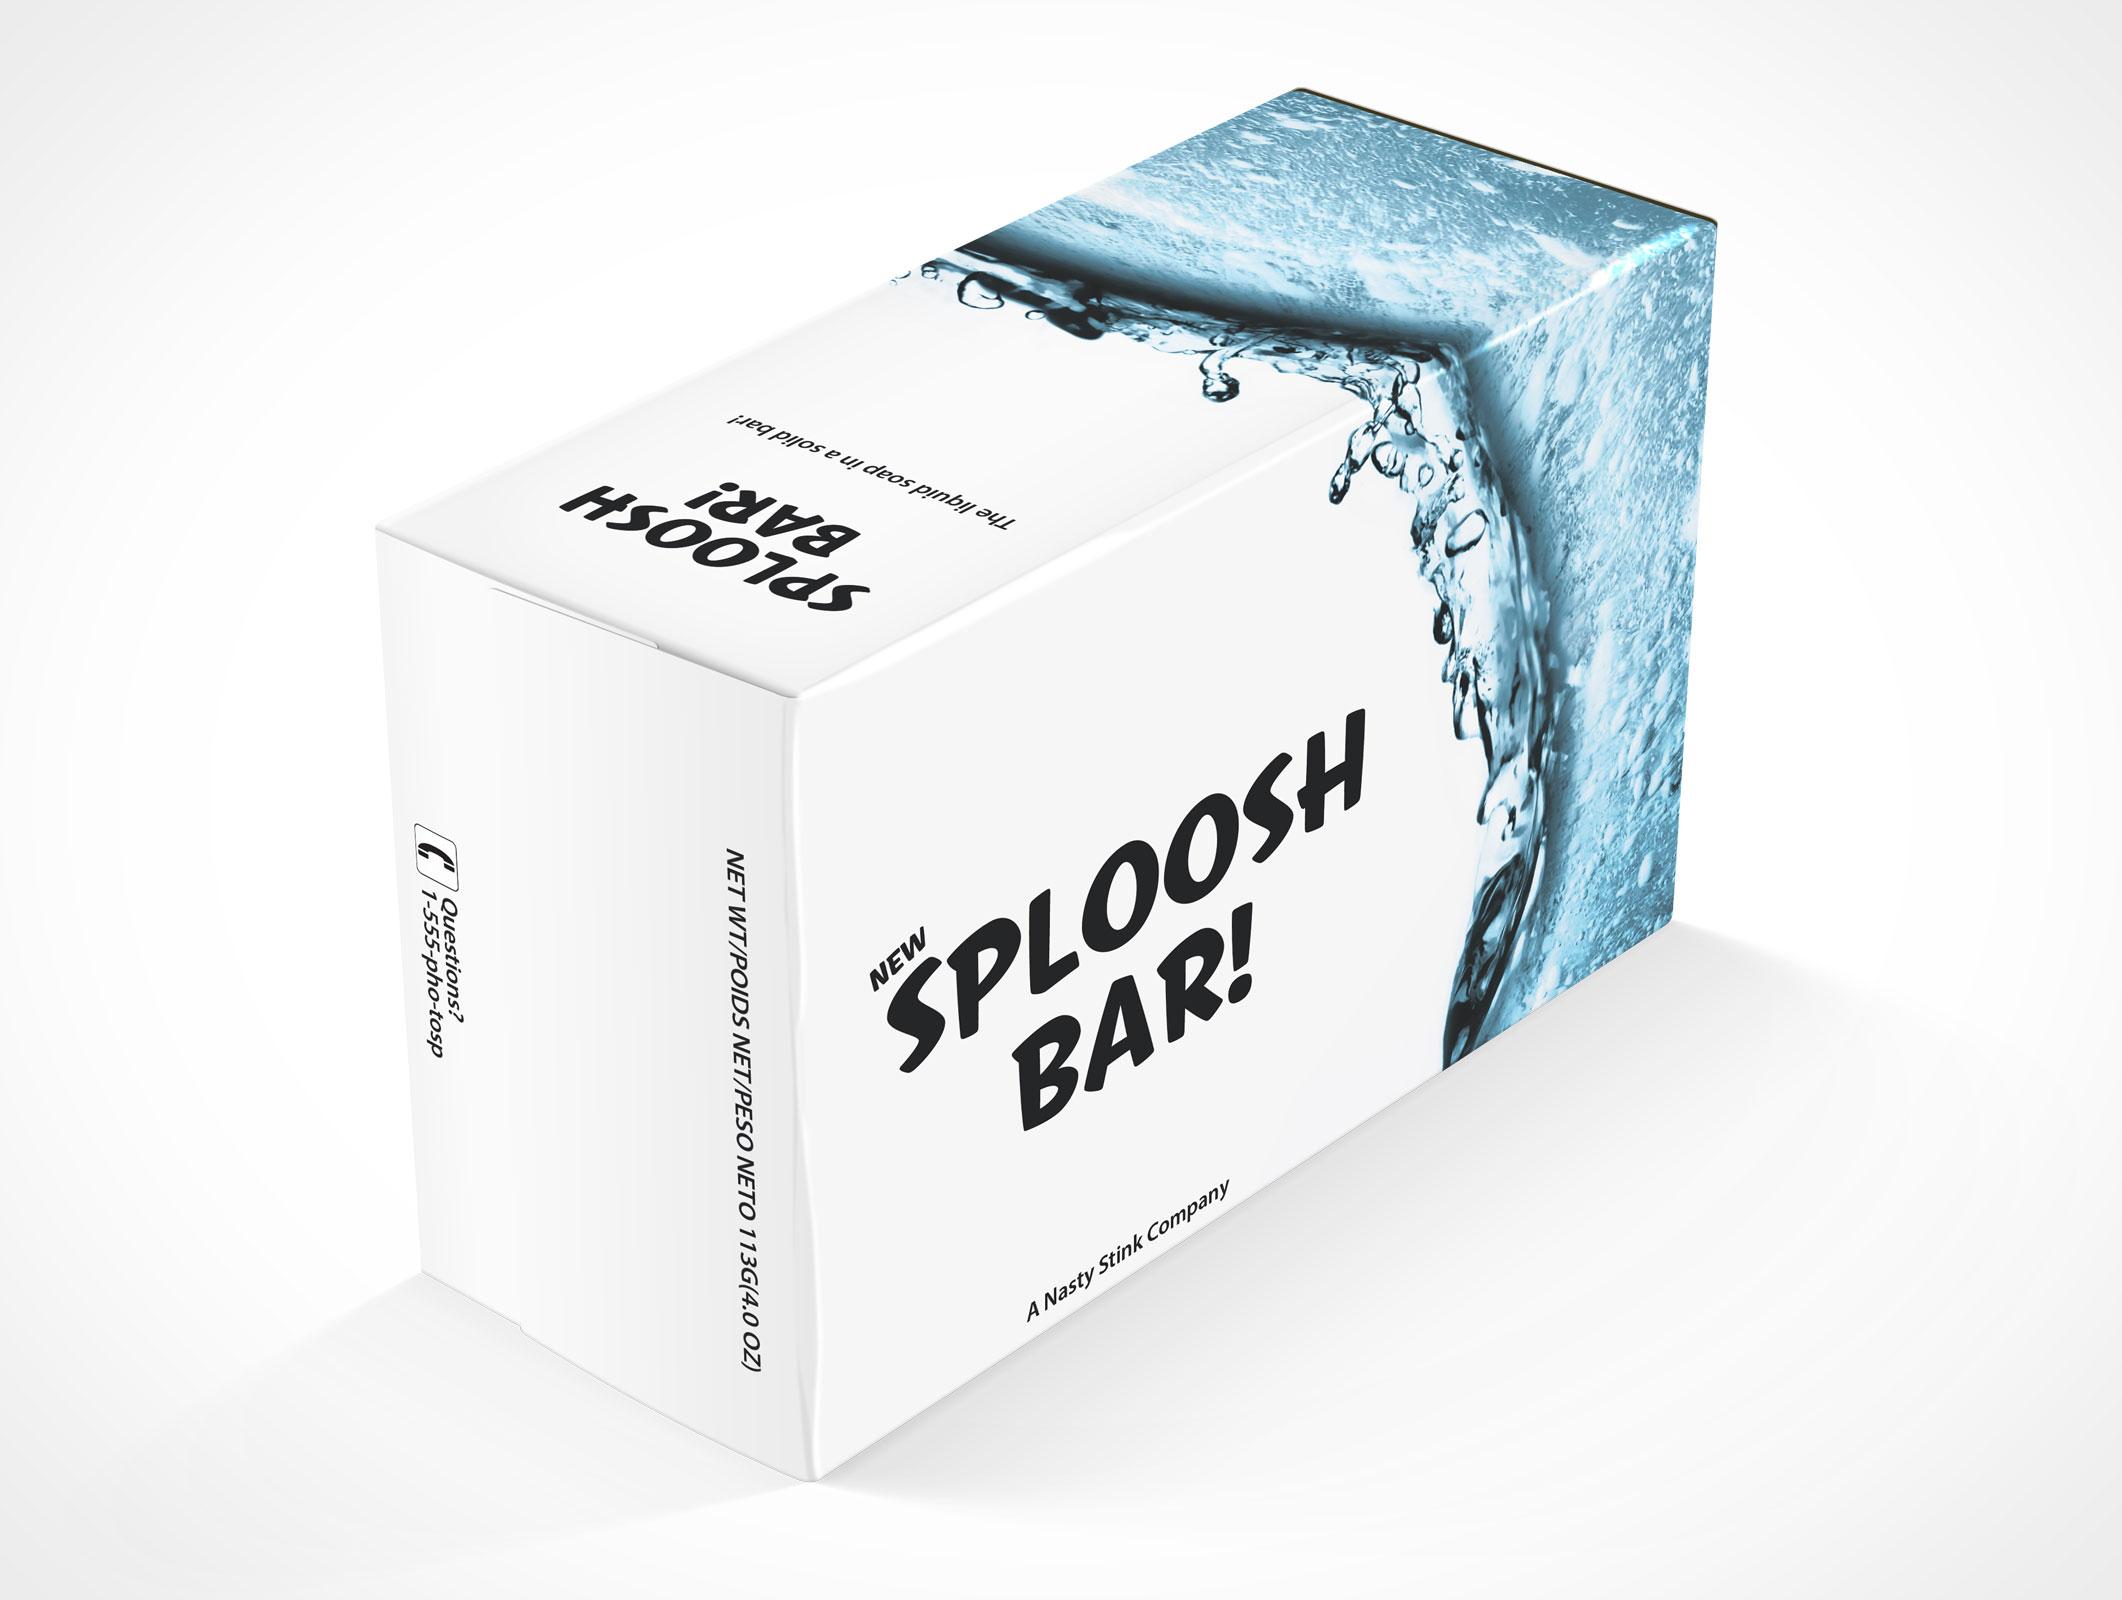 soapbox001 market your psd mockups for soap box